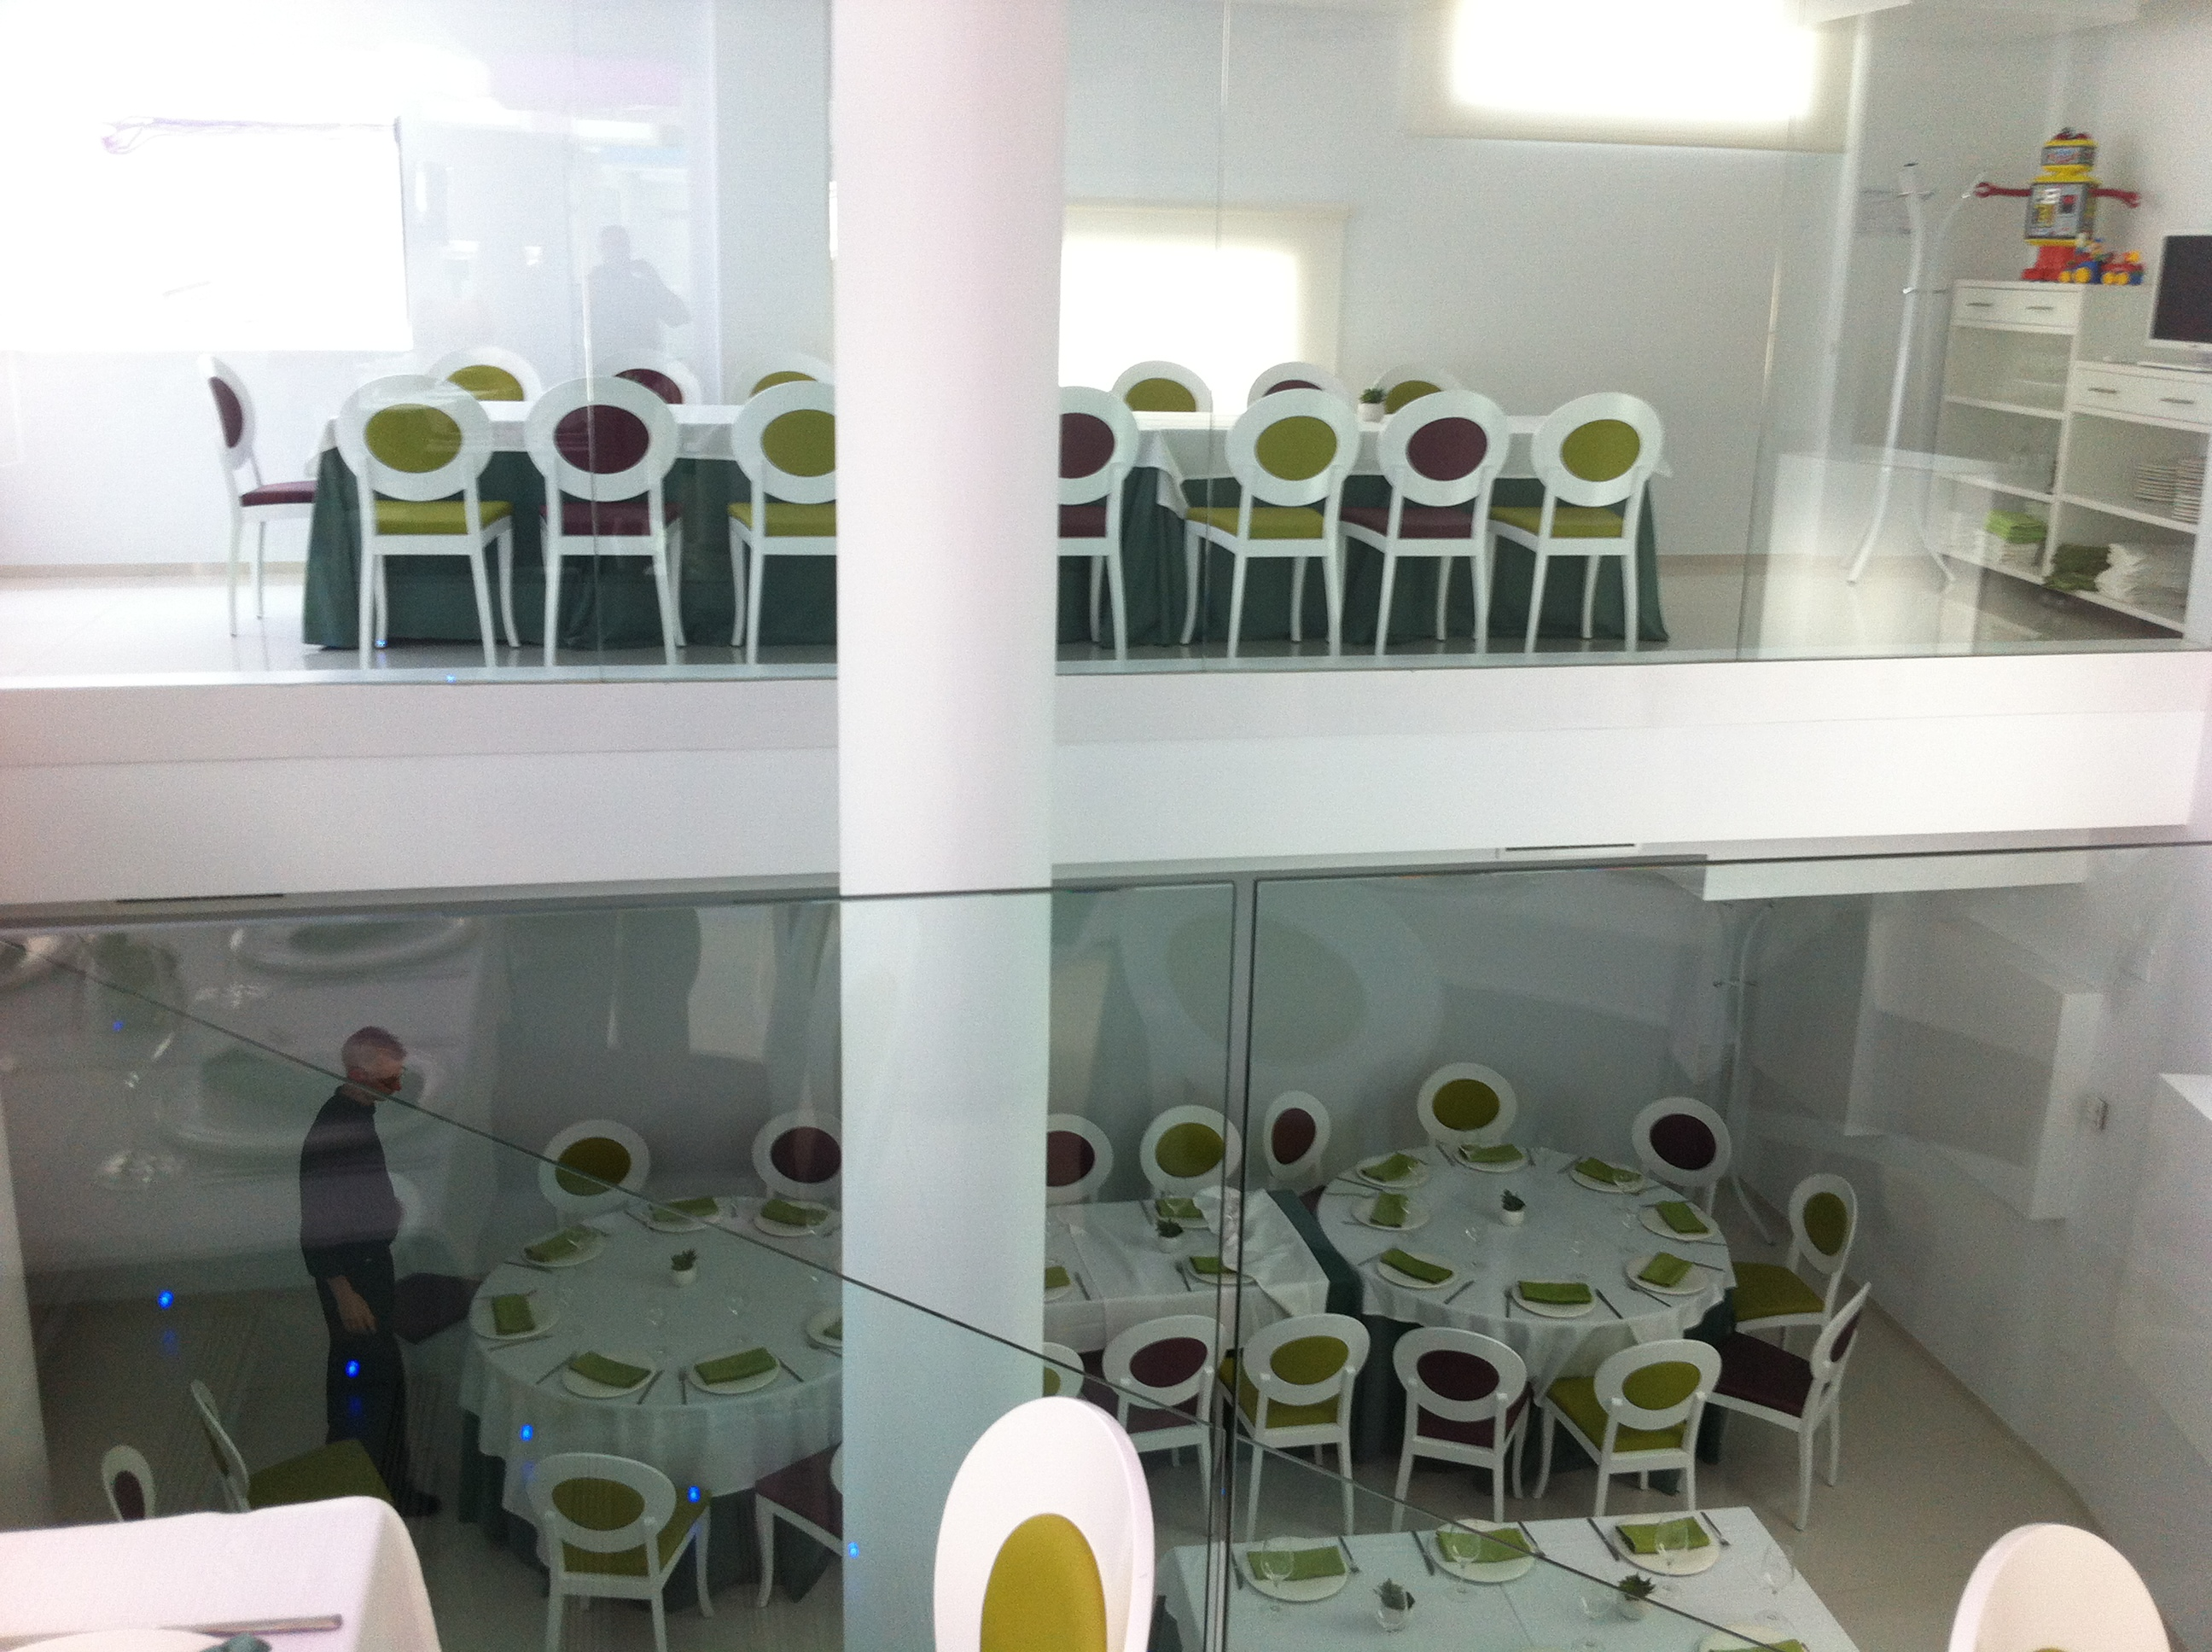 1º Blogtrip familiar en el Hotel del Juguete de Ibi  #ToyHotelTrip, Mario Schumacher Blog